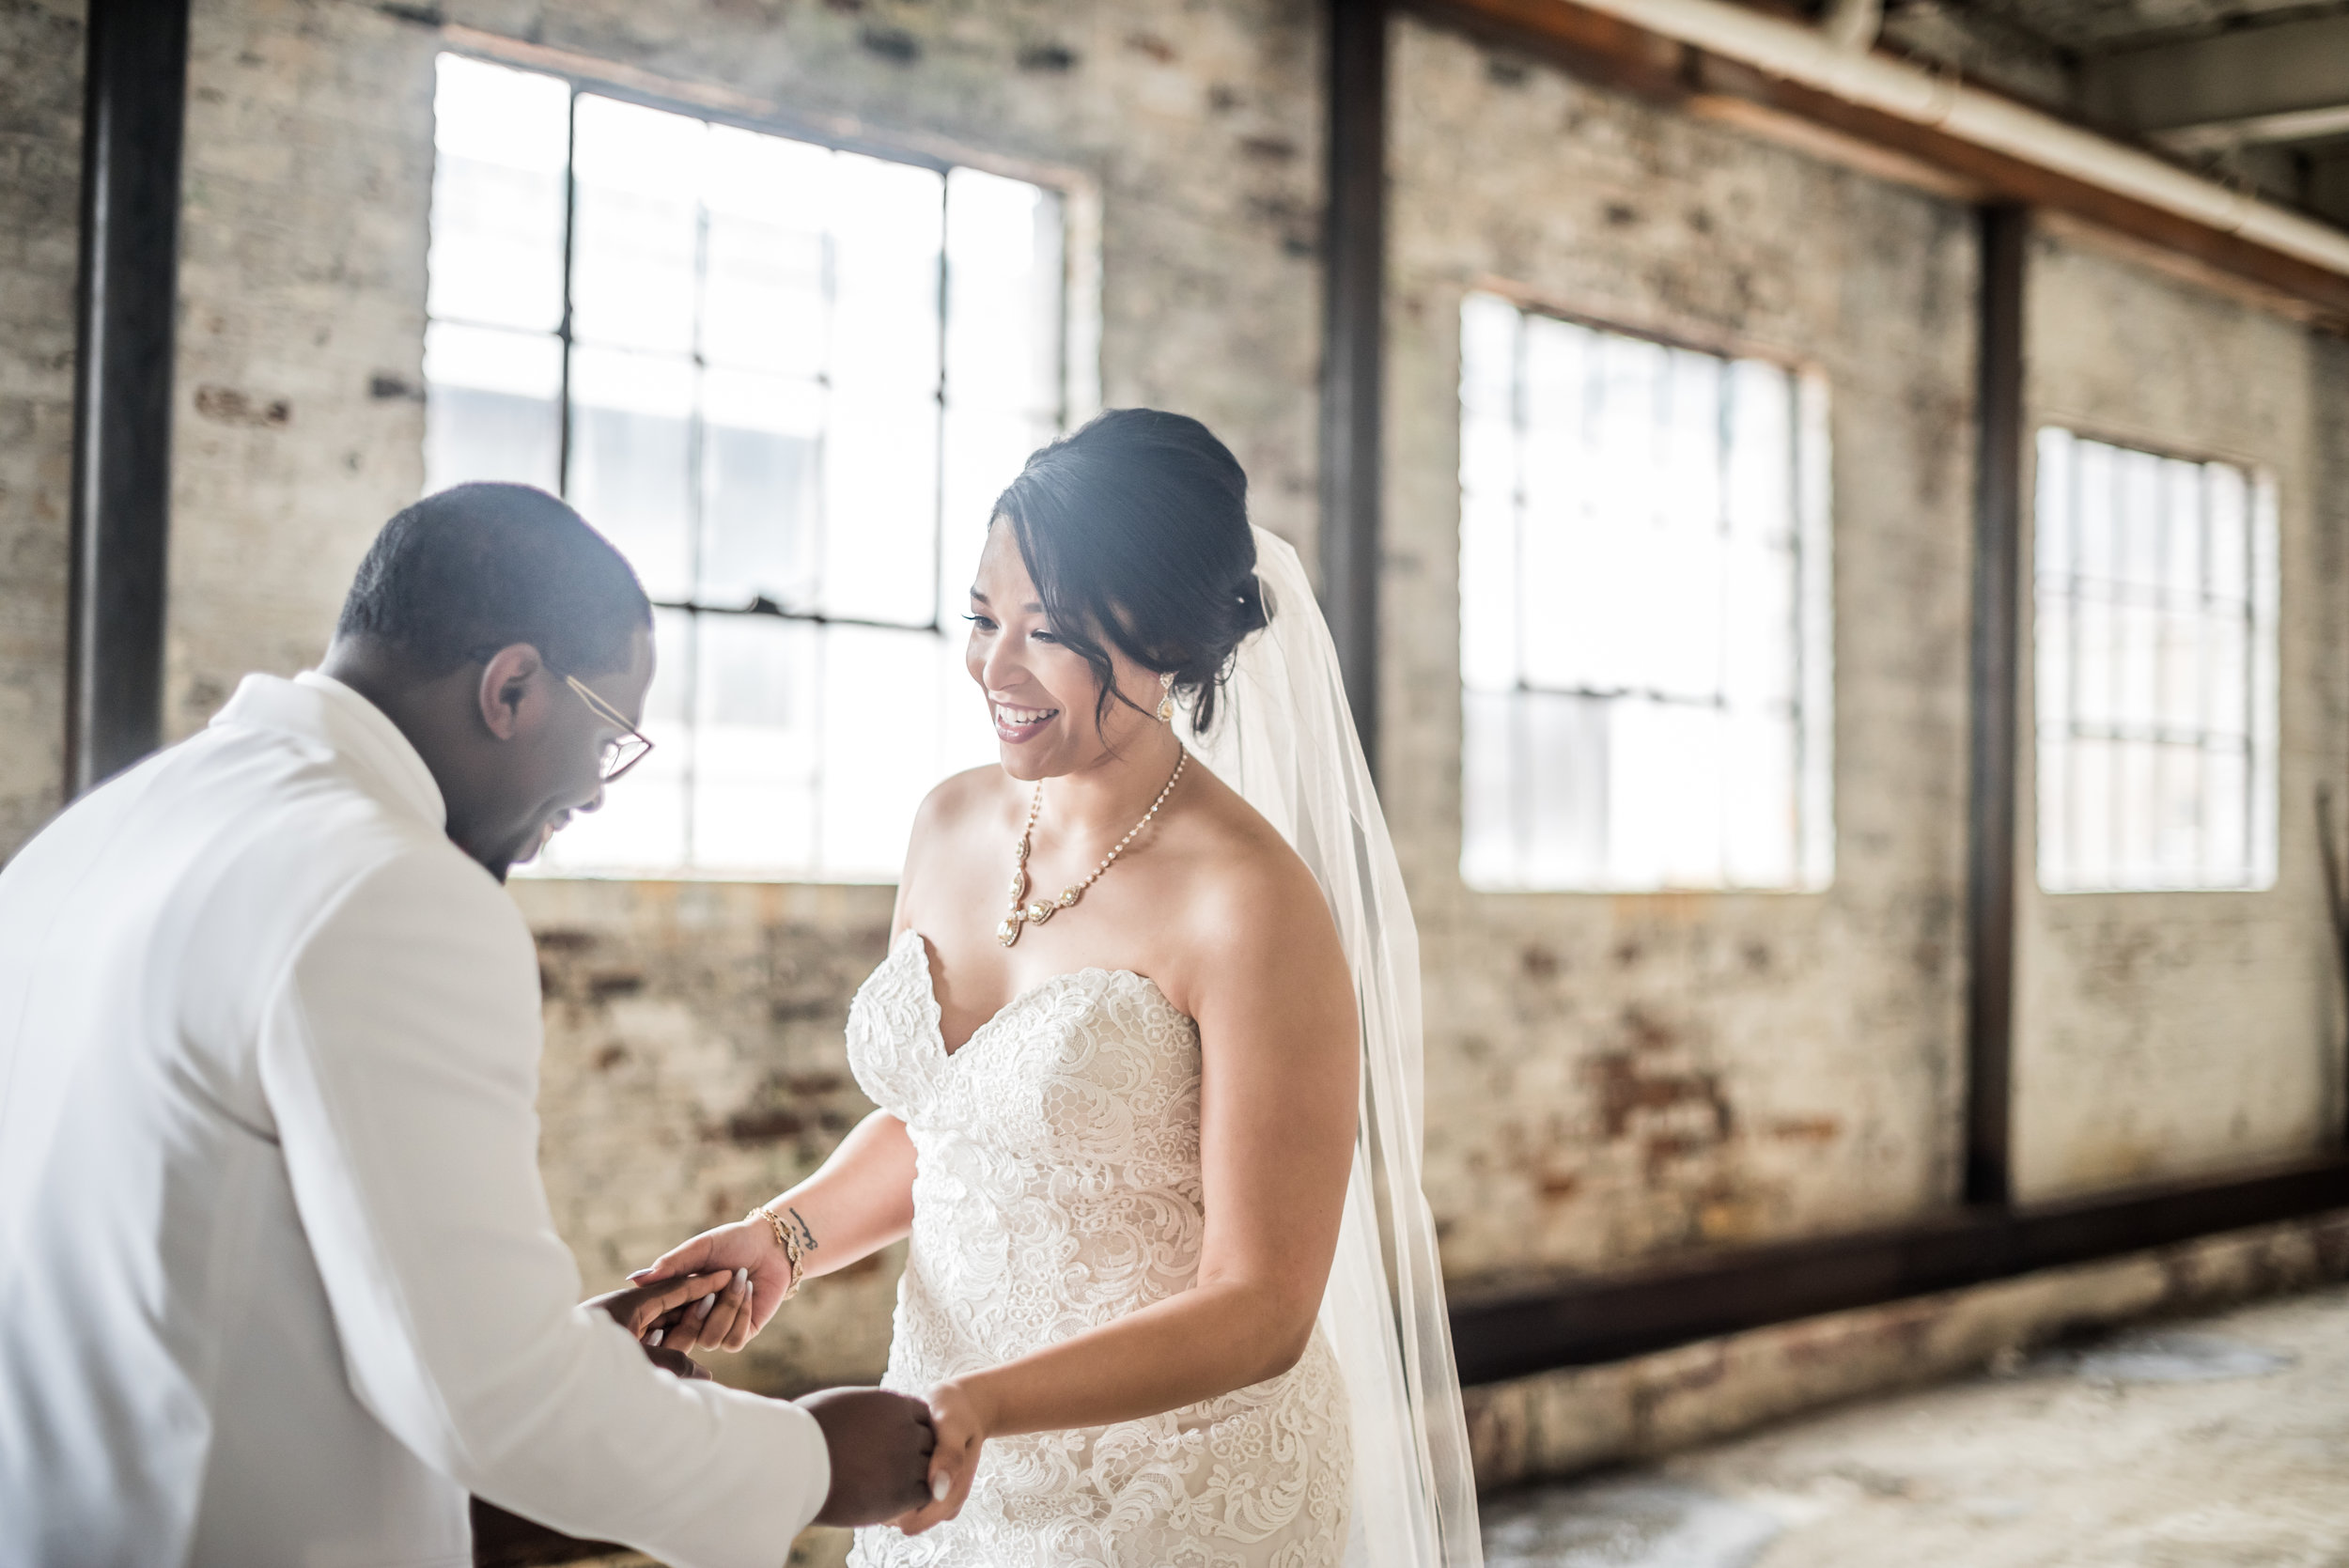 Burlington Iowa Wedding Midwest Photographer Melissa Cervantes _ Chantelle and Isaiah 104g.jpg